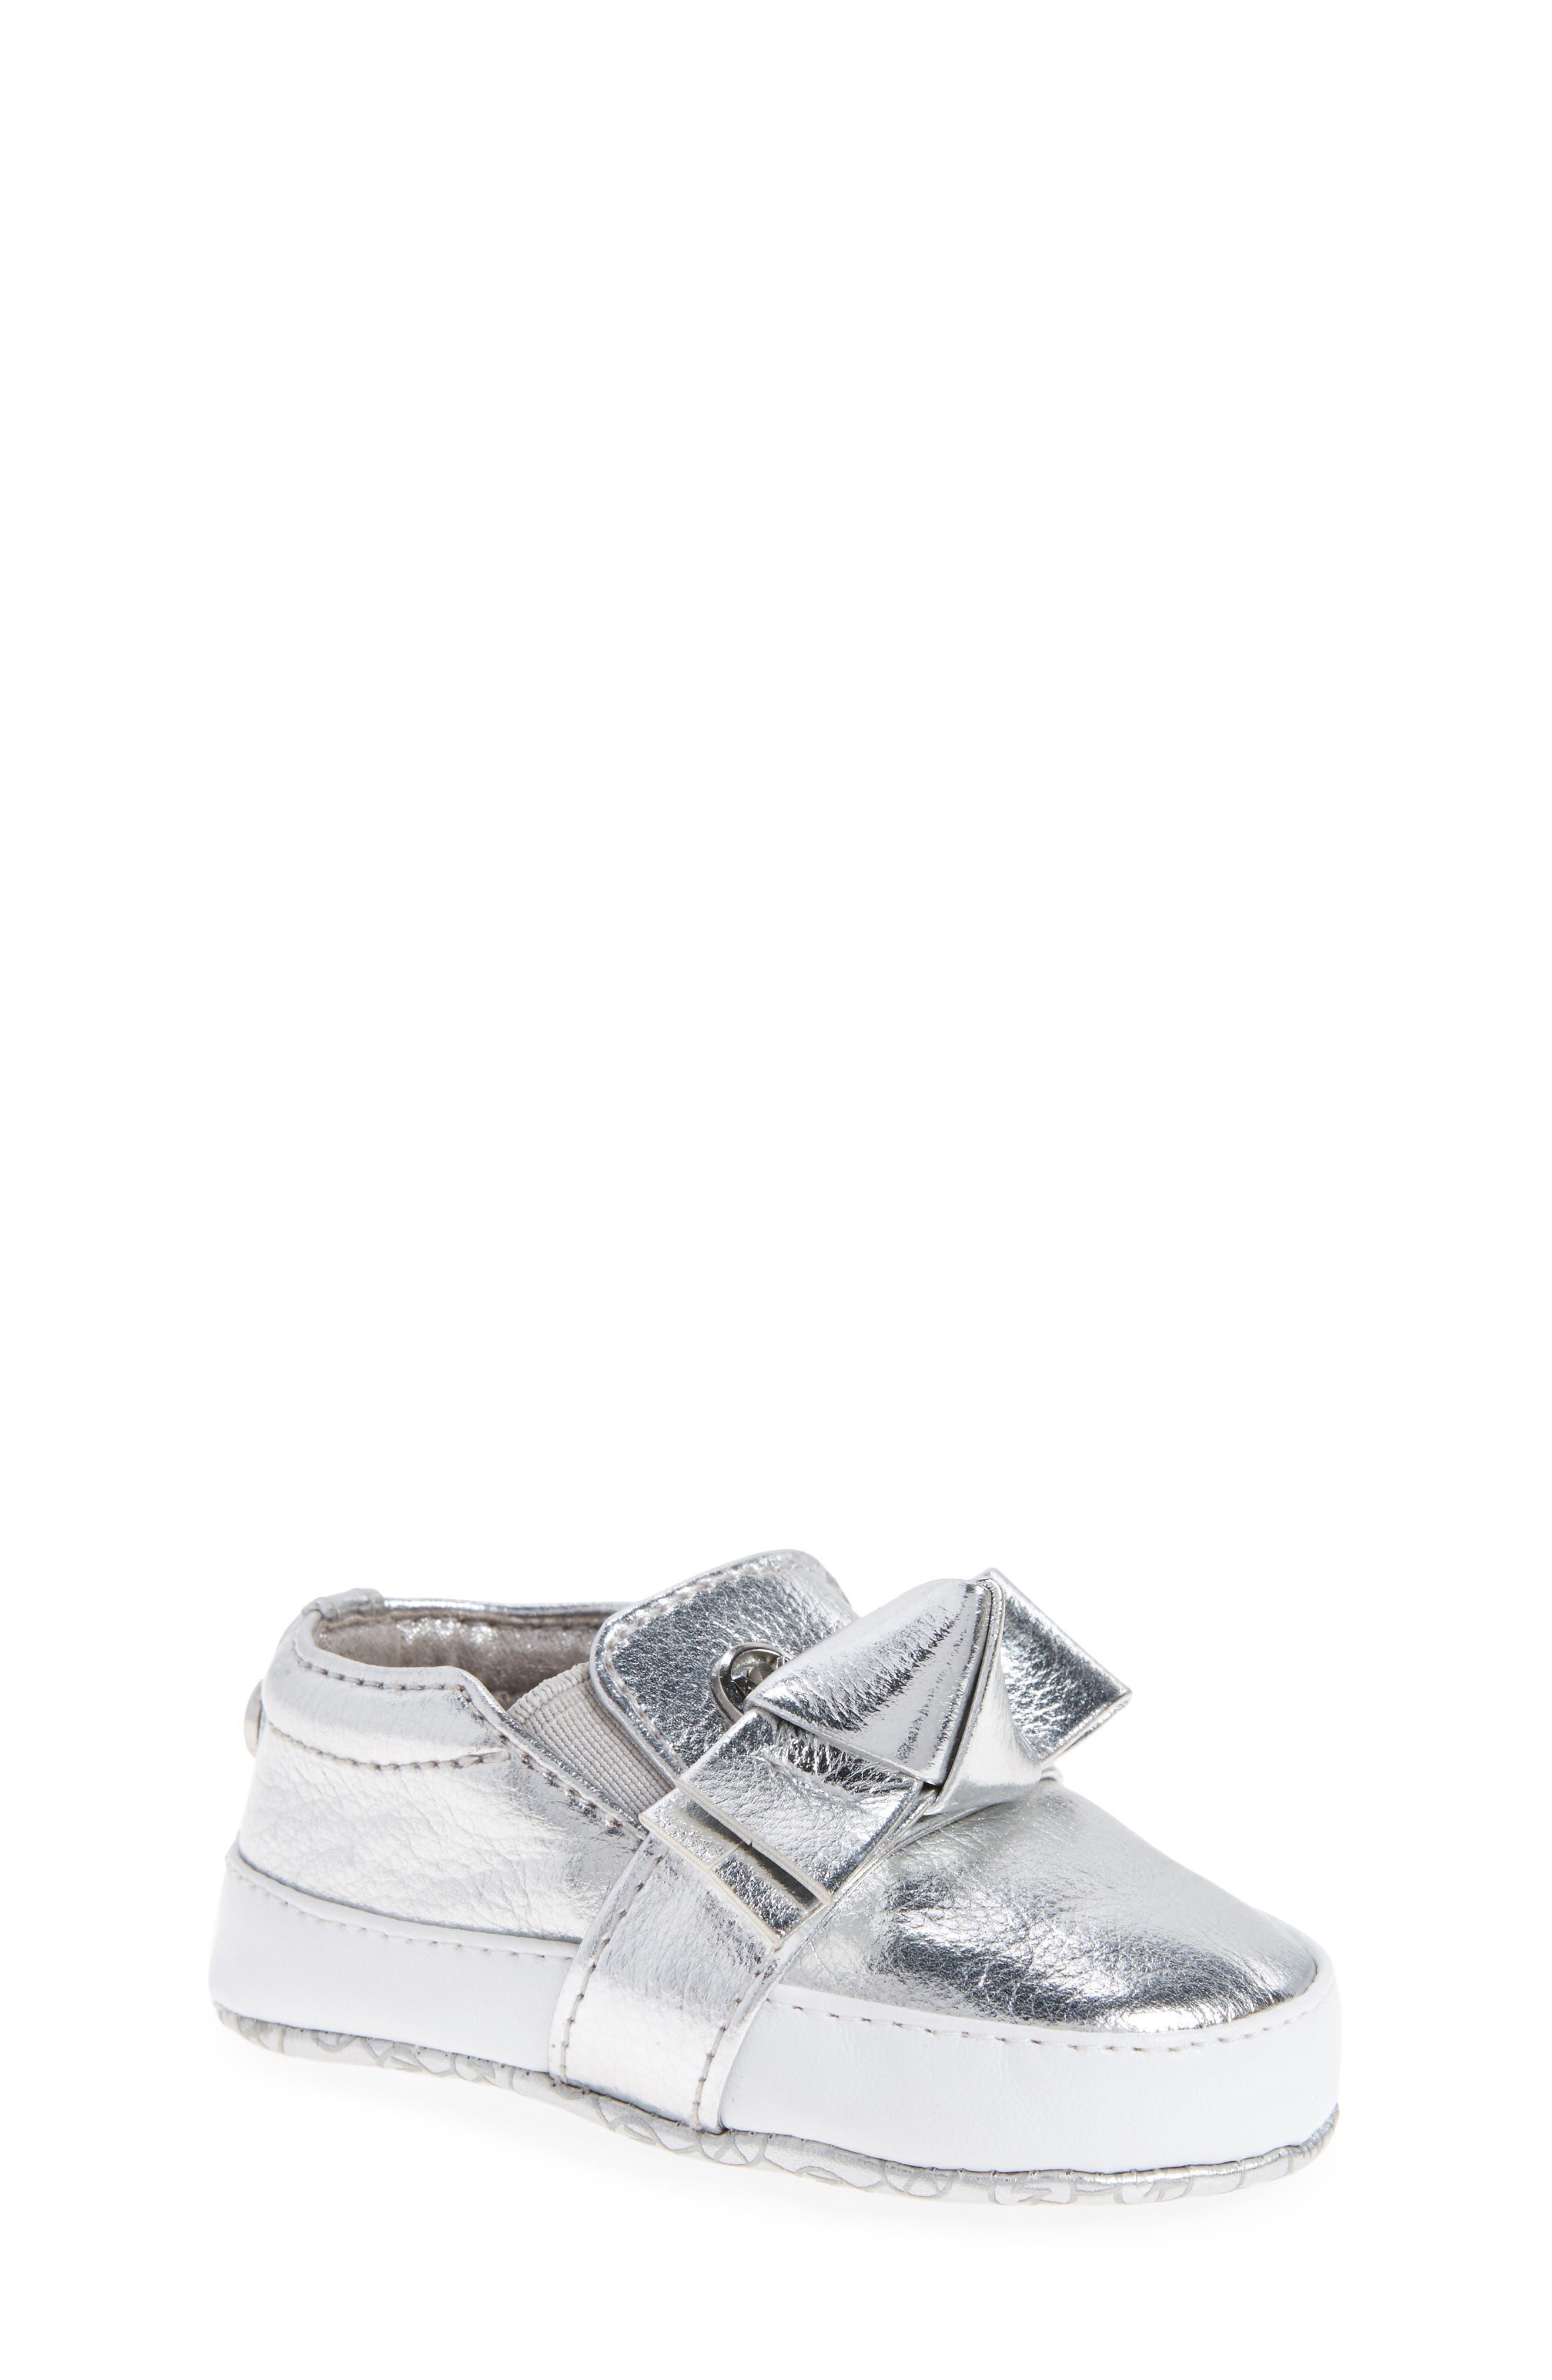 Main Image - MICHAEL Michael Kors Baby Poppy Slip-On Crib Shoe (Baby)